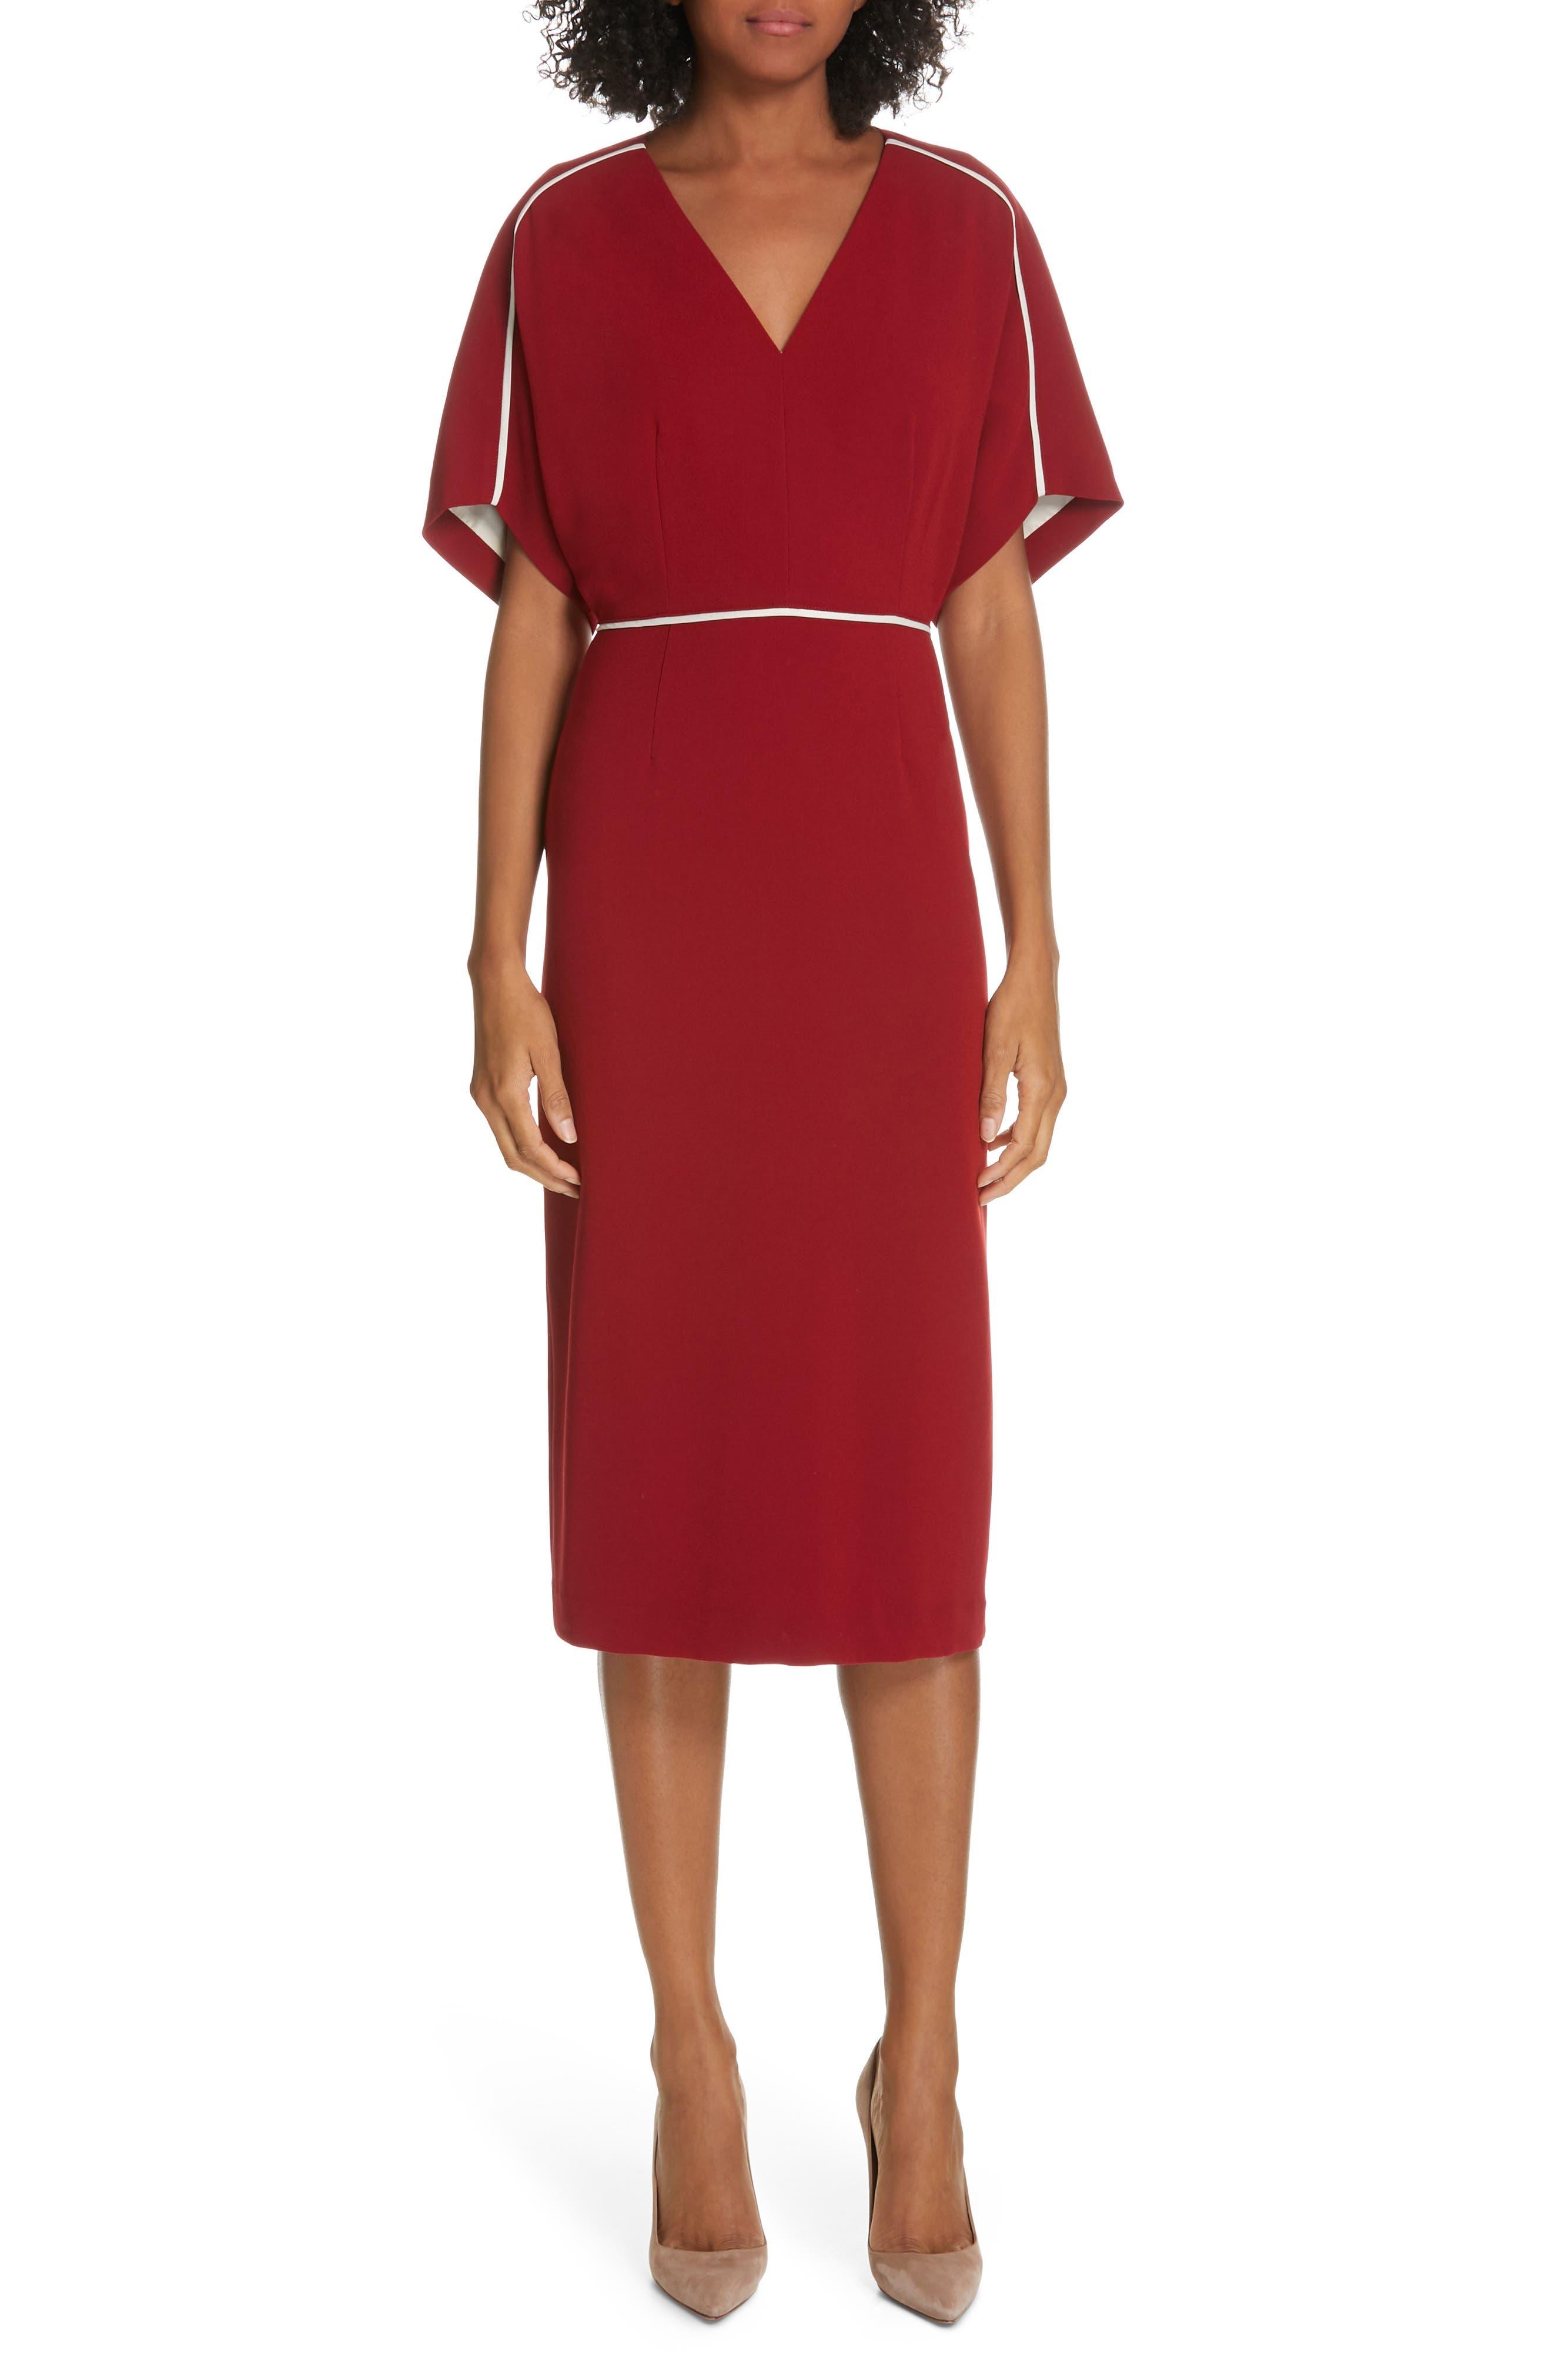 Judith & Charles Juliet Sheath Dress, Red